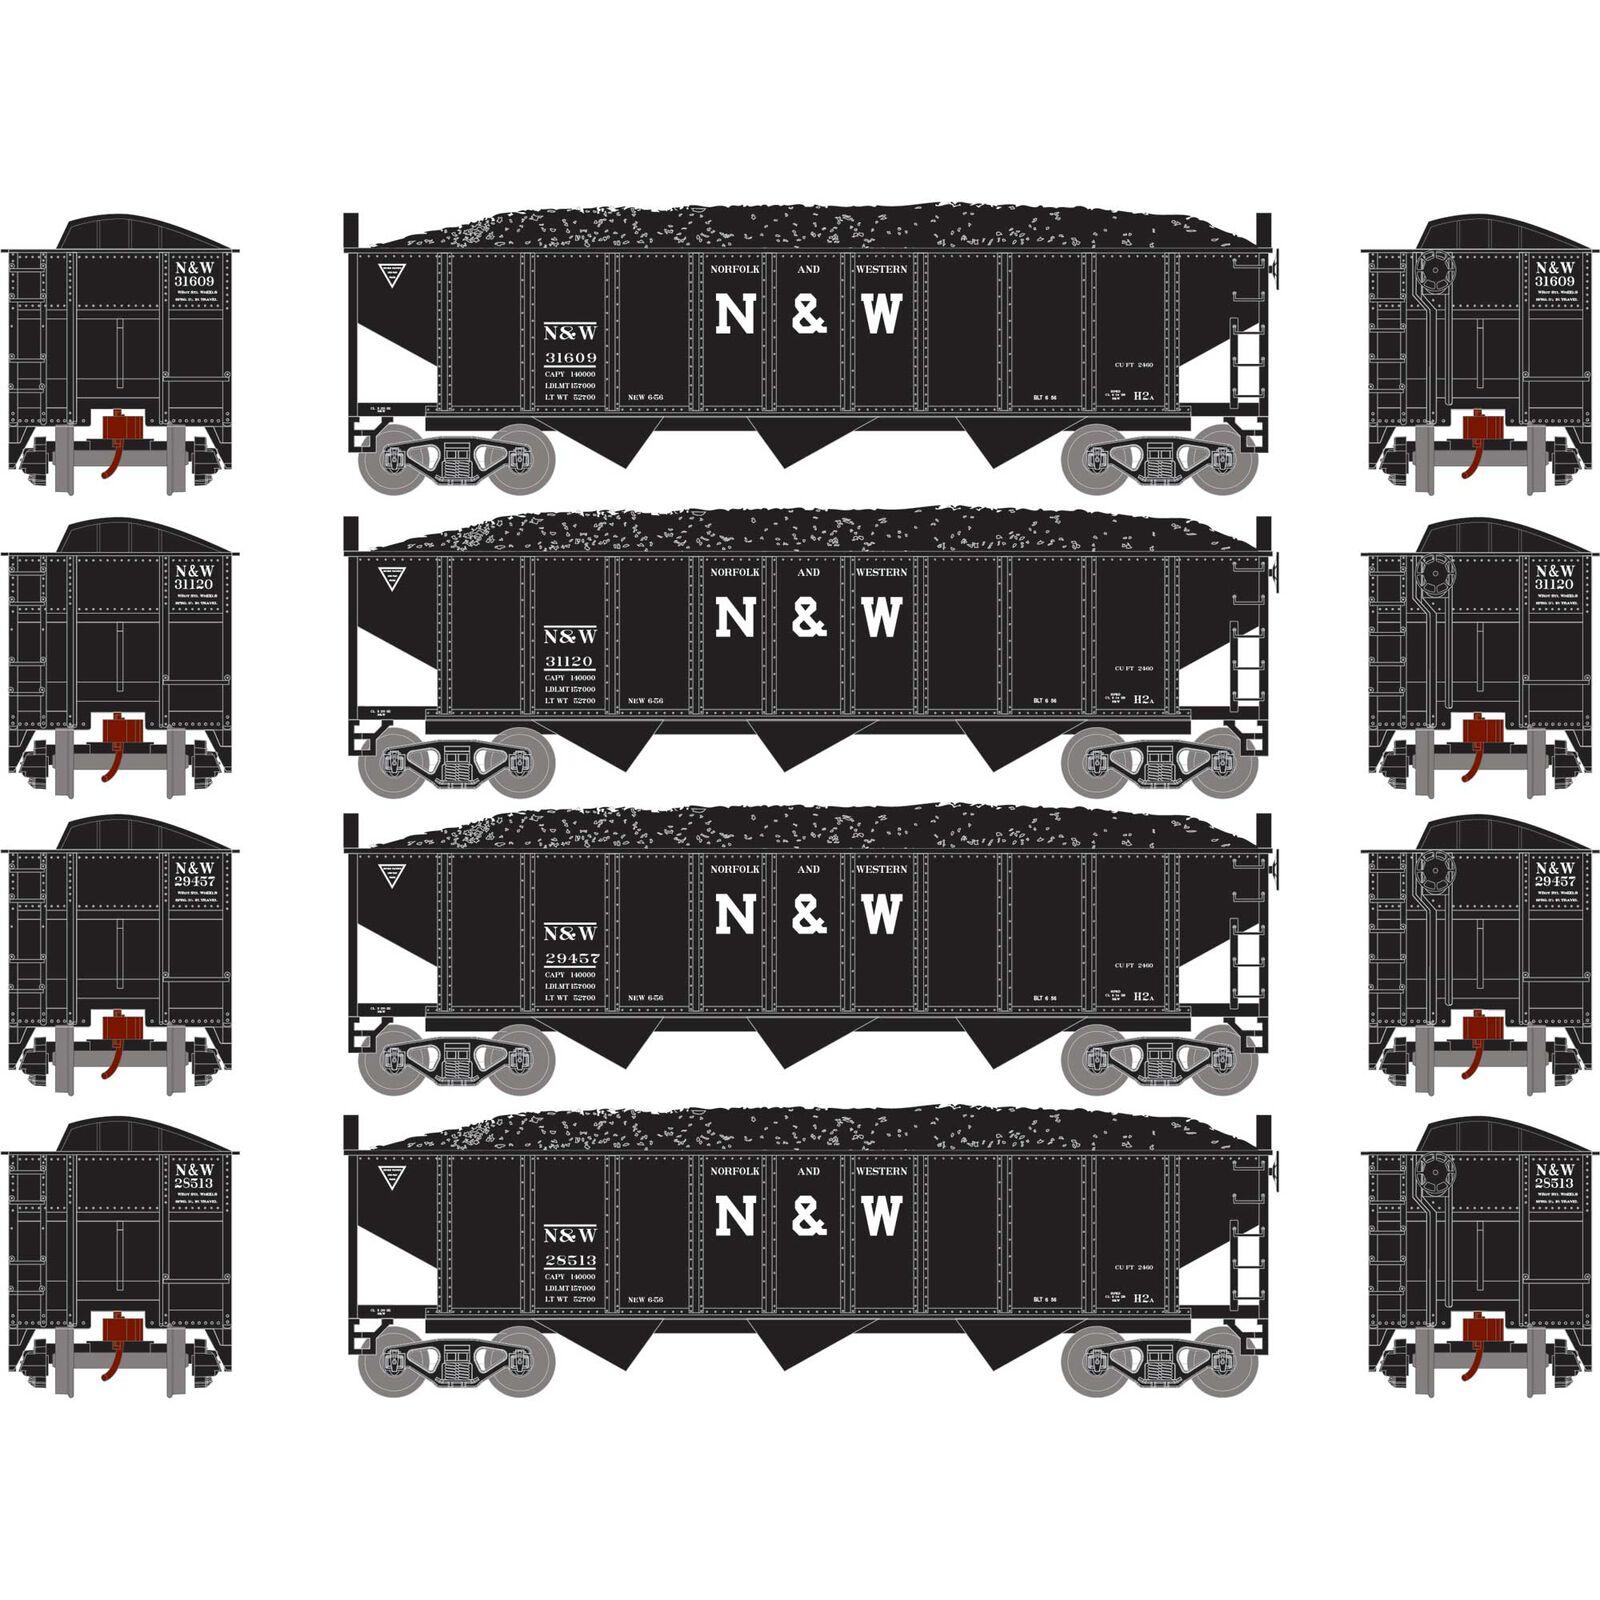 N 40' 3-Bay Ribbed Hopper with Load, N&W #1 (4)